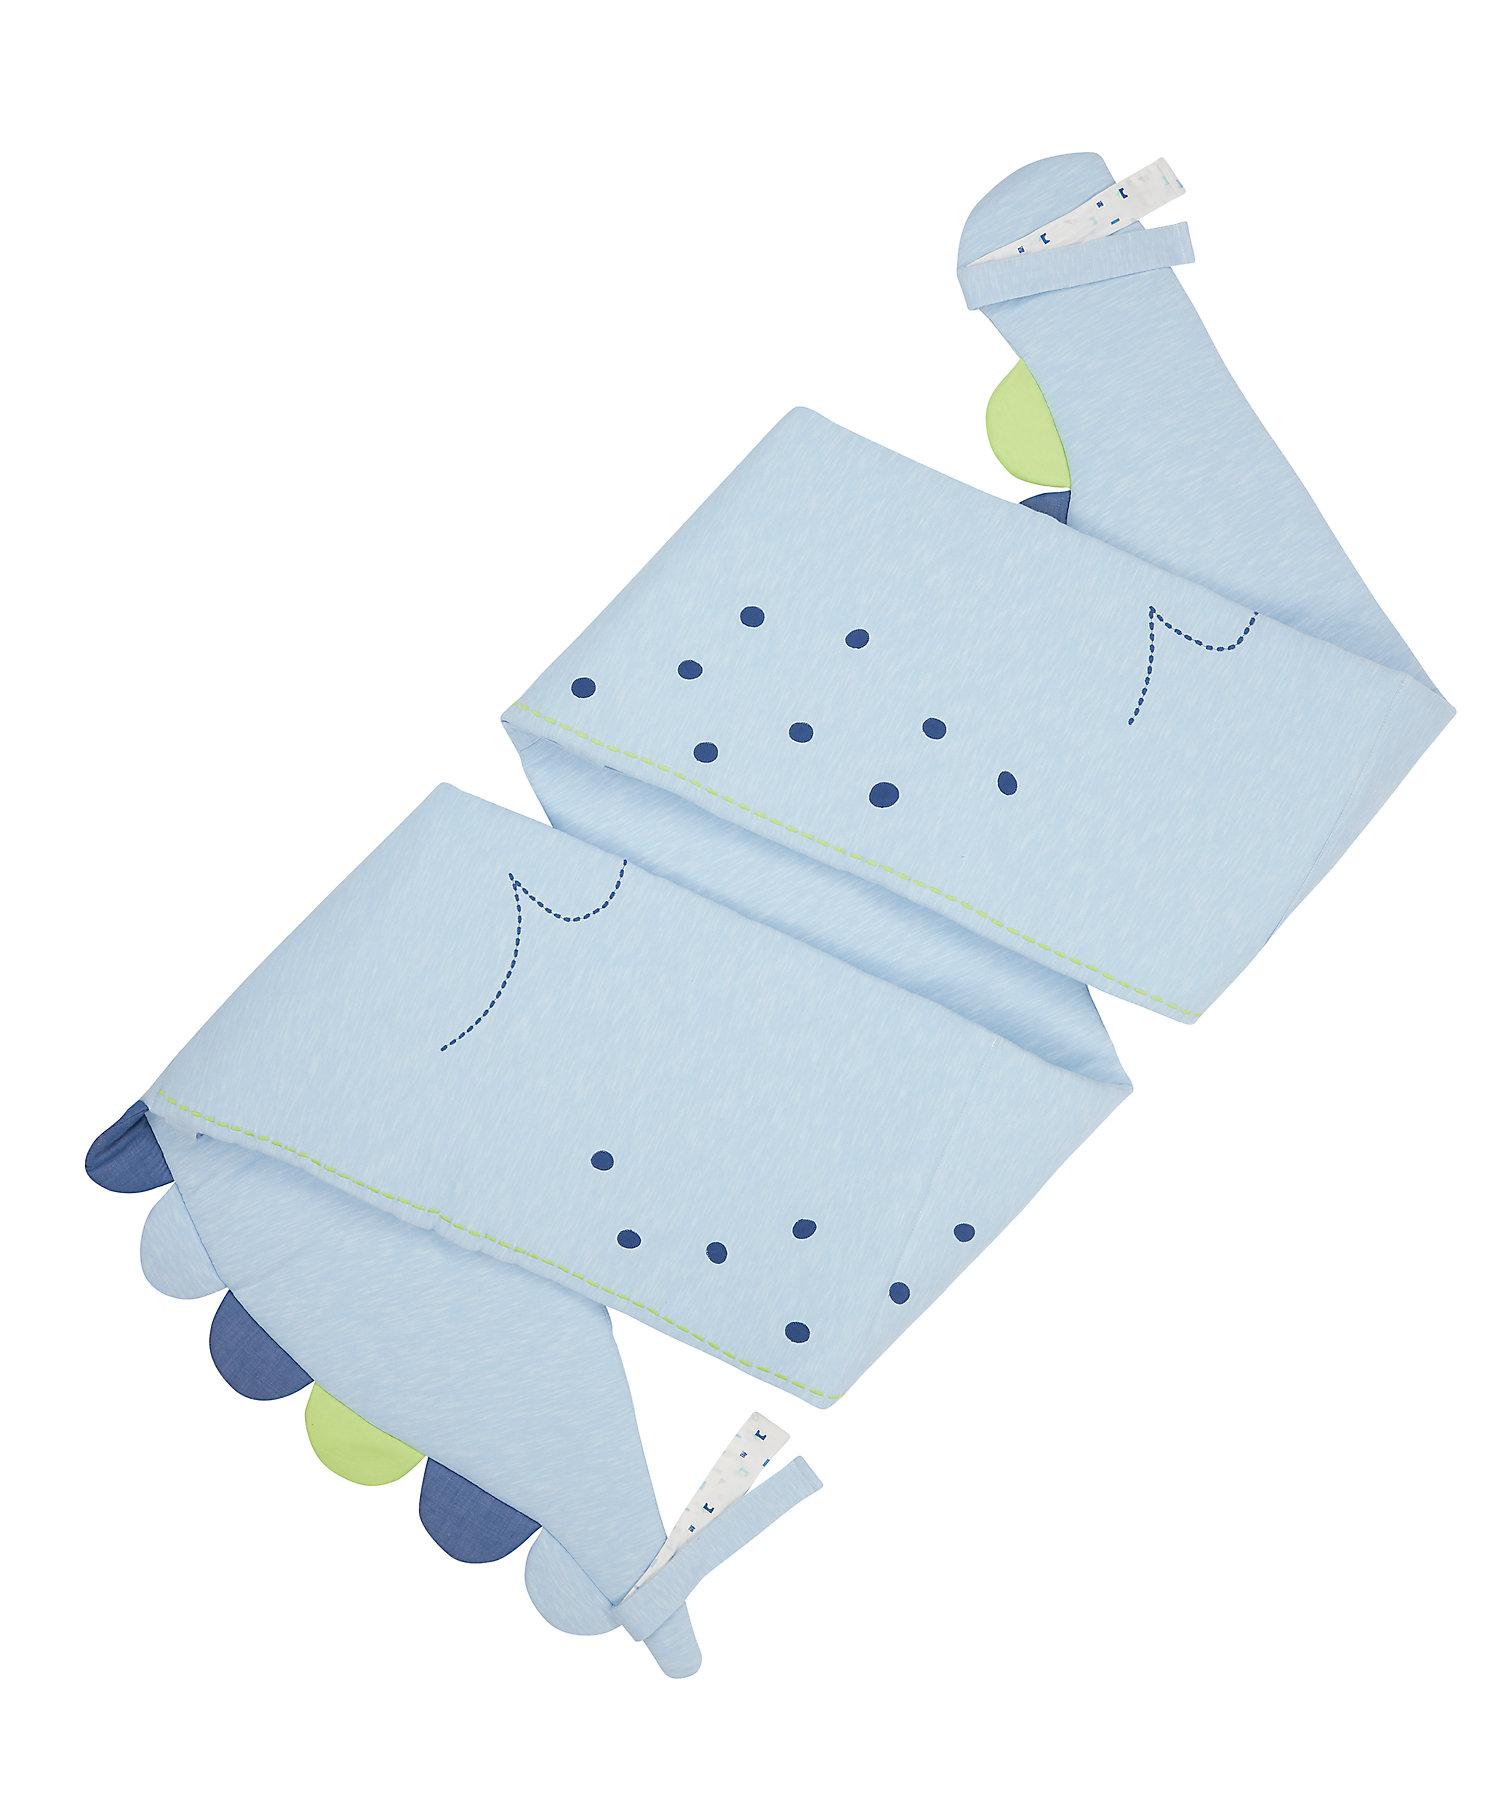 Mothercare | Mothercare Sleepysaurus Long Bumper  Baby Bedding Sets Blue